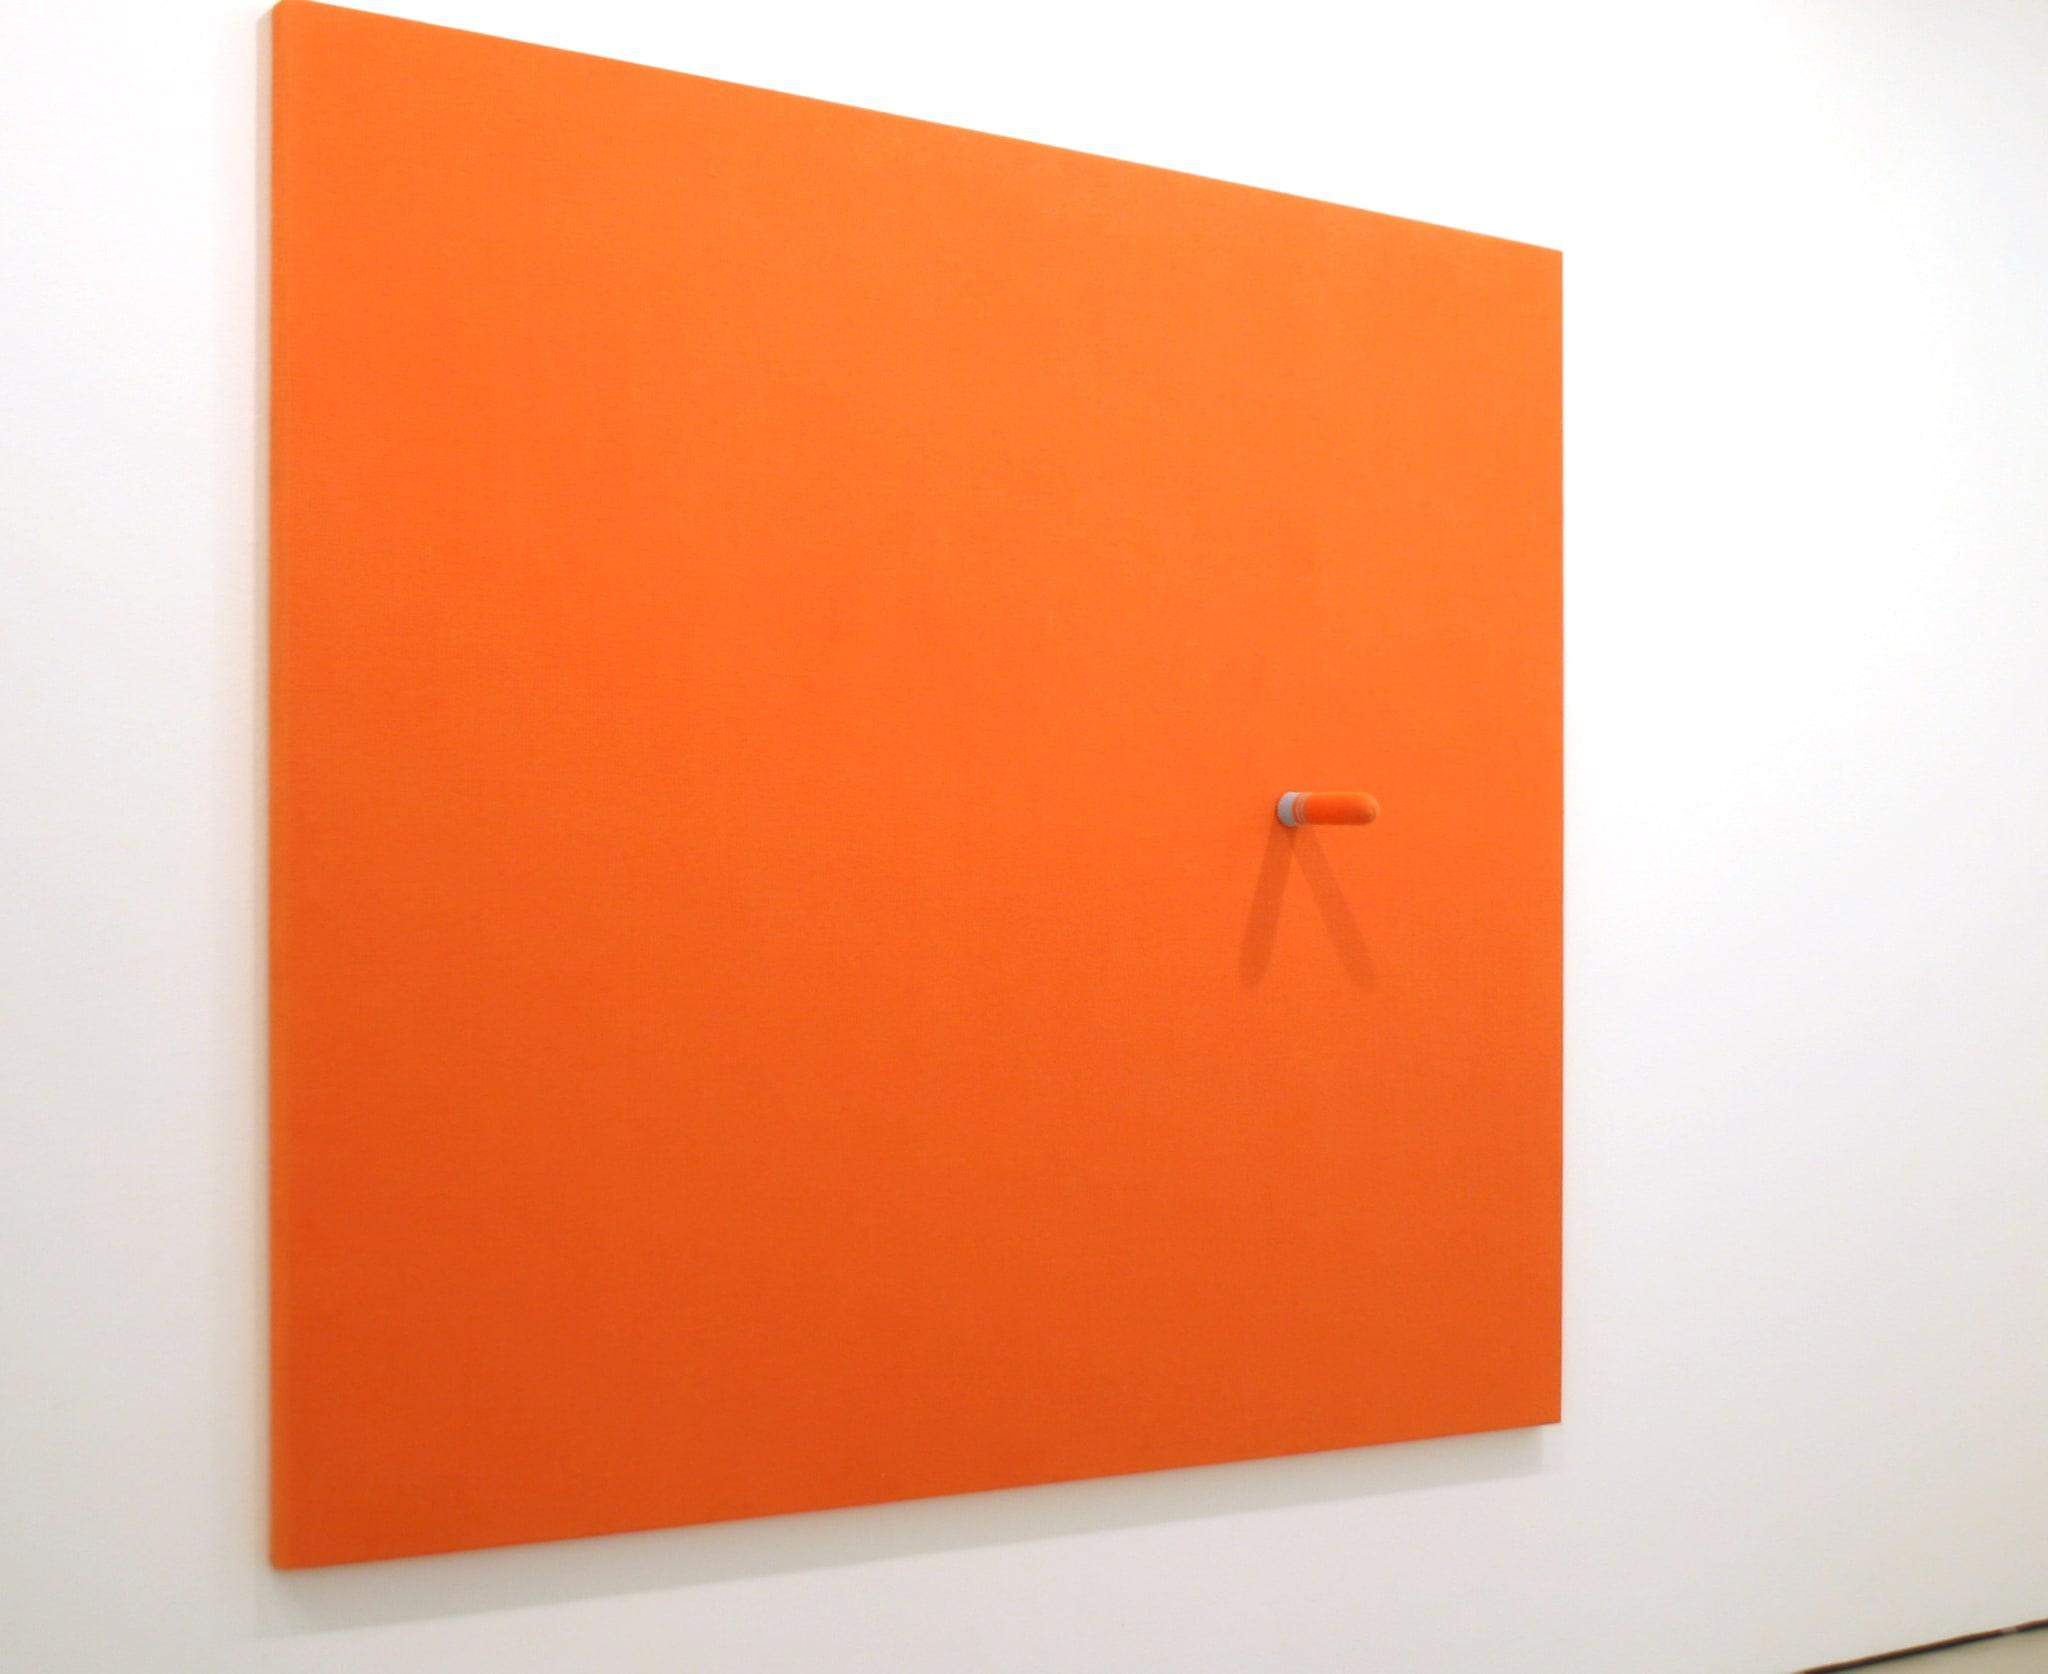 Stand Orange by Erwin Wurm